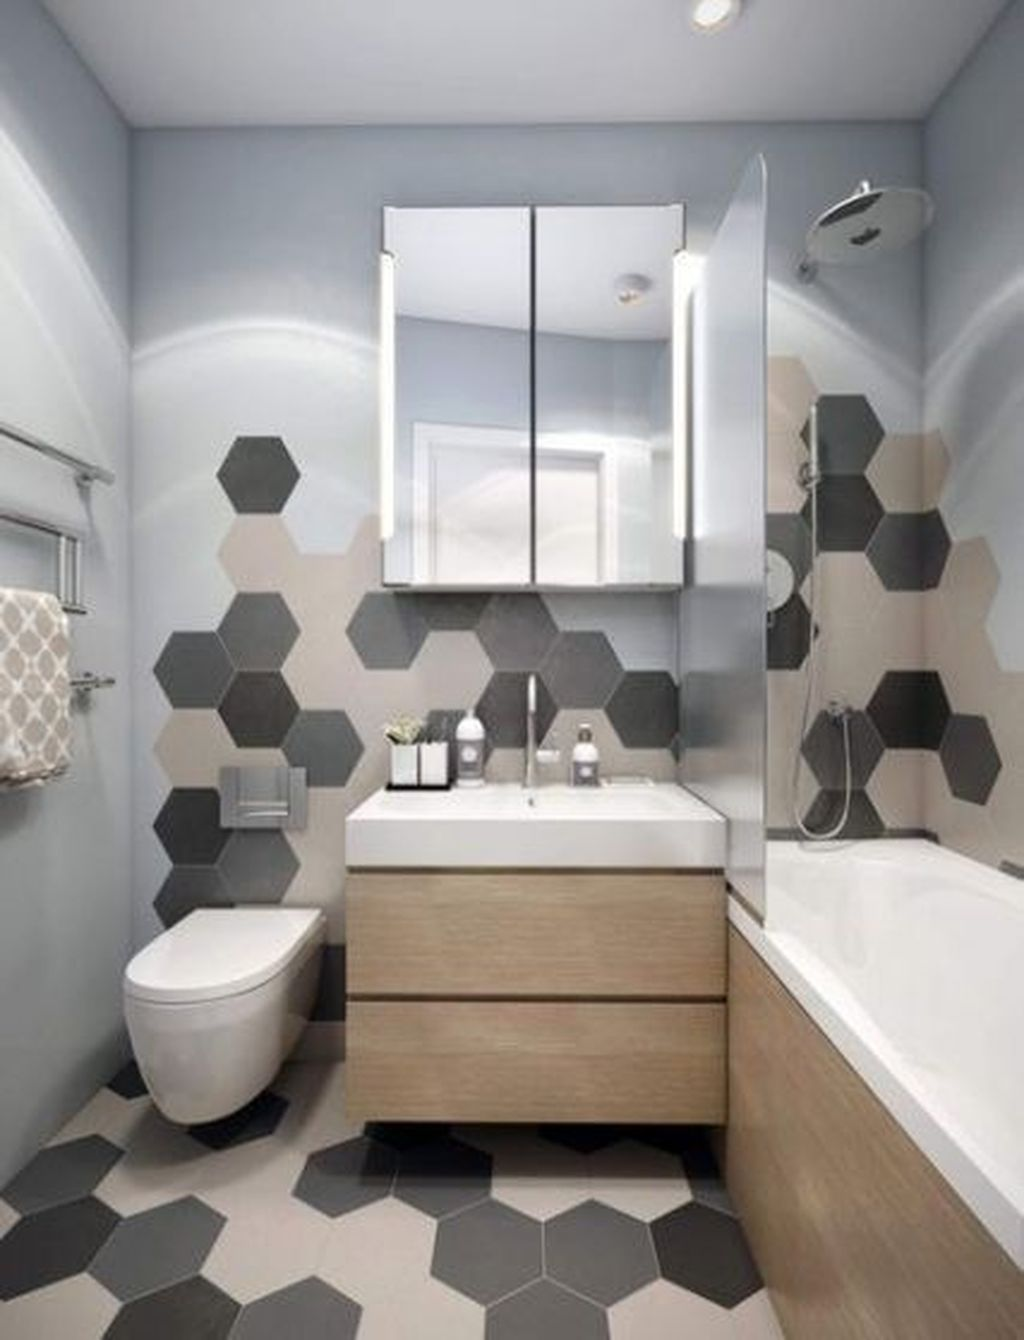 Inspiring Bathroom Tile Ideas 07